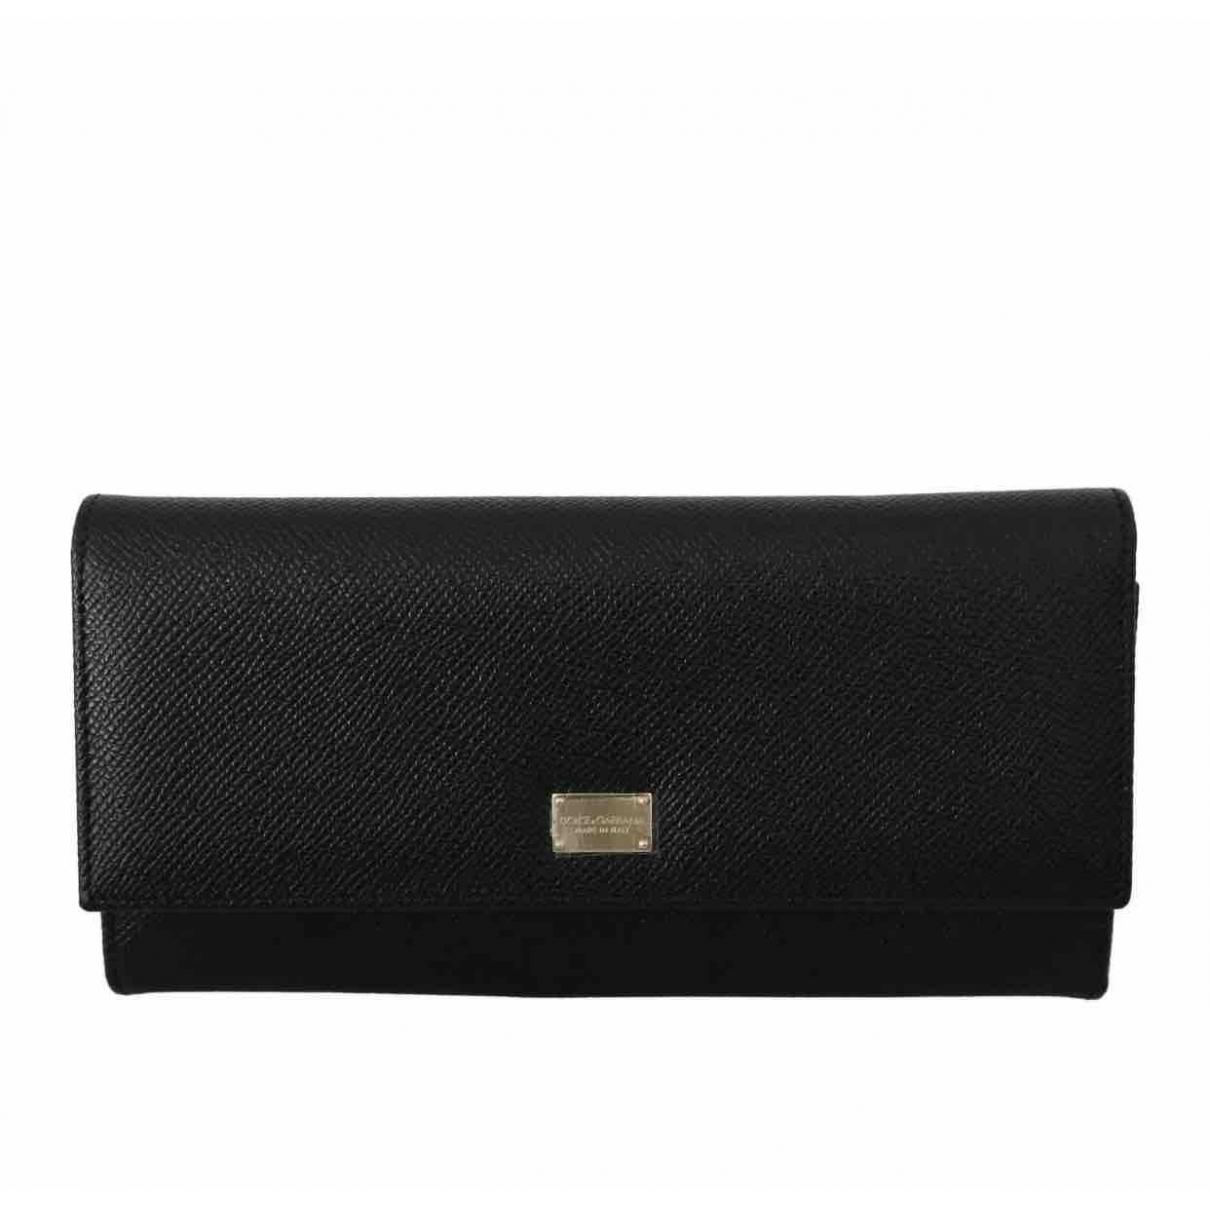 Dolce & Gabbana \N Black Leather Clutch bag for Women \N